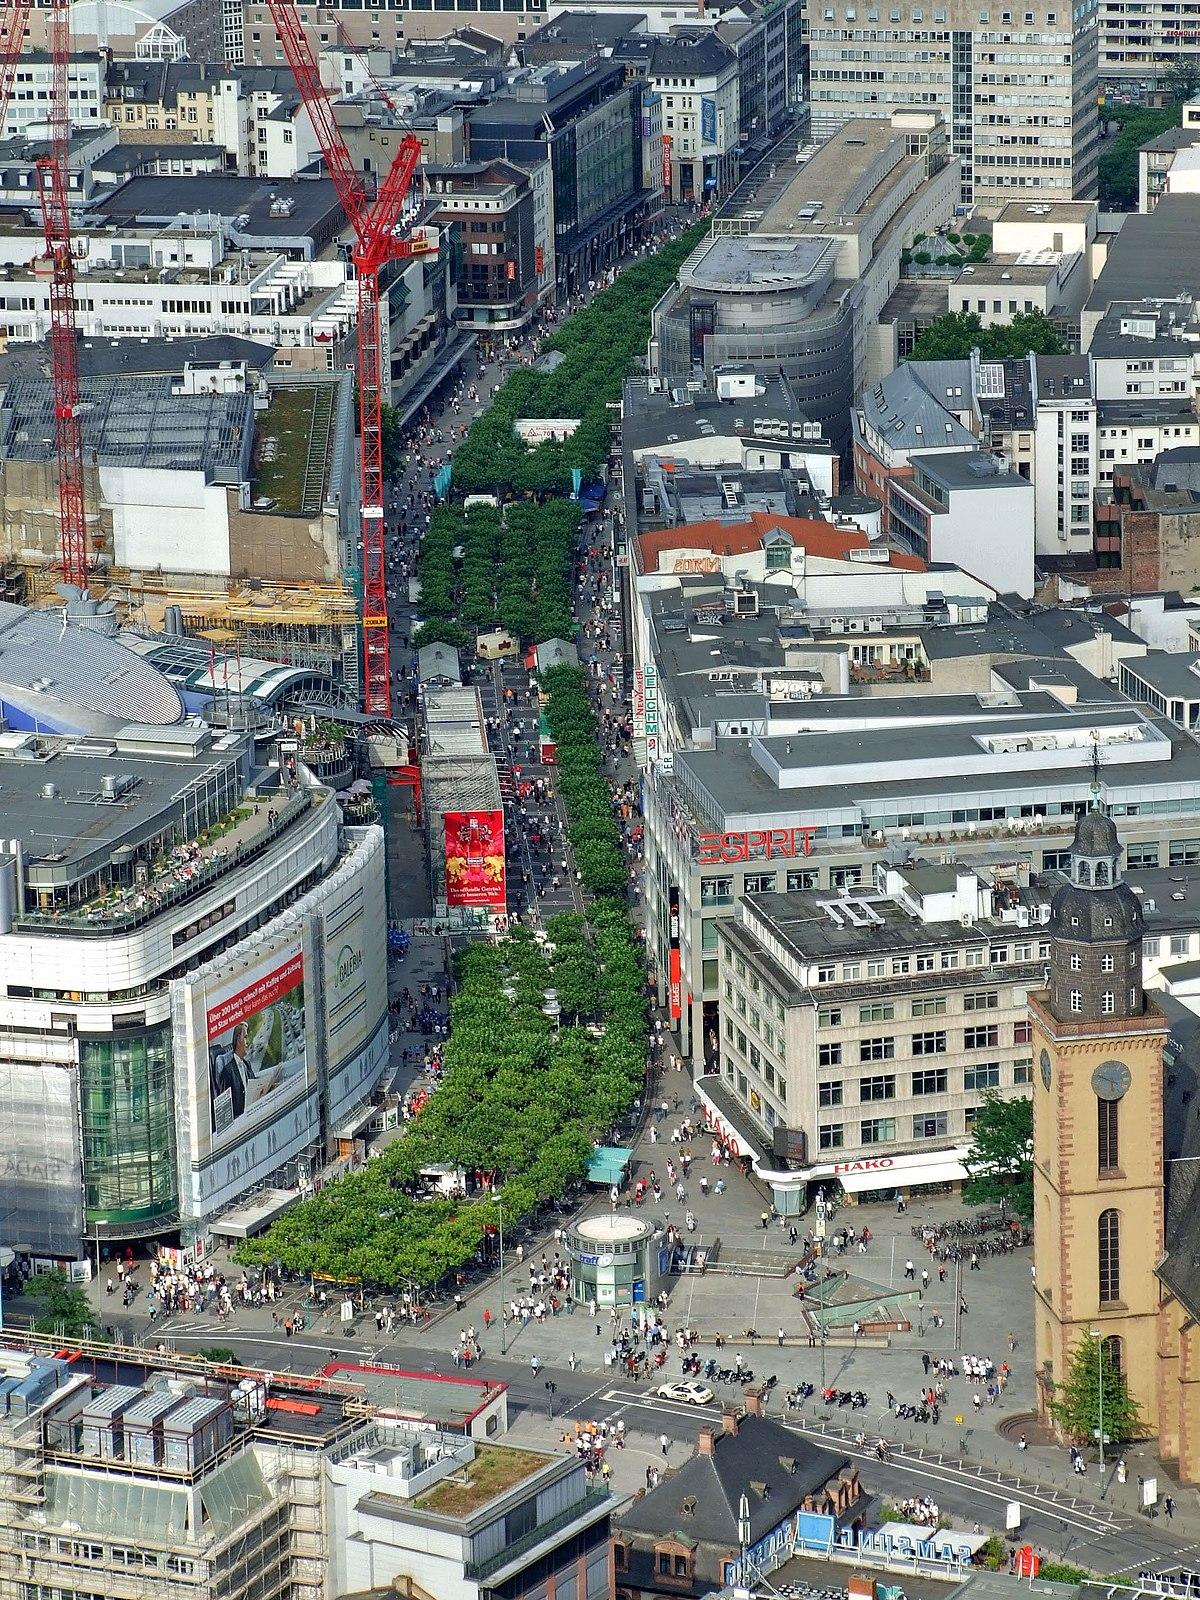 Hotel Zeil Frankfurt Tripadvisor